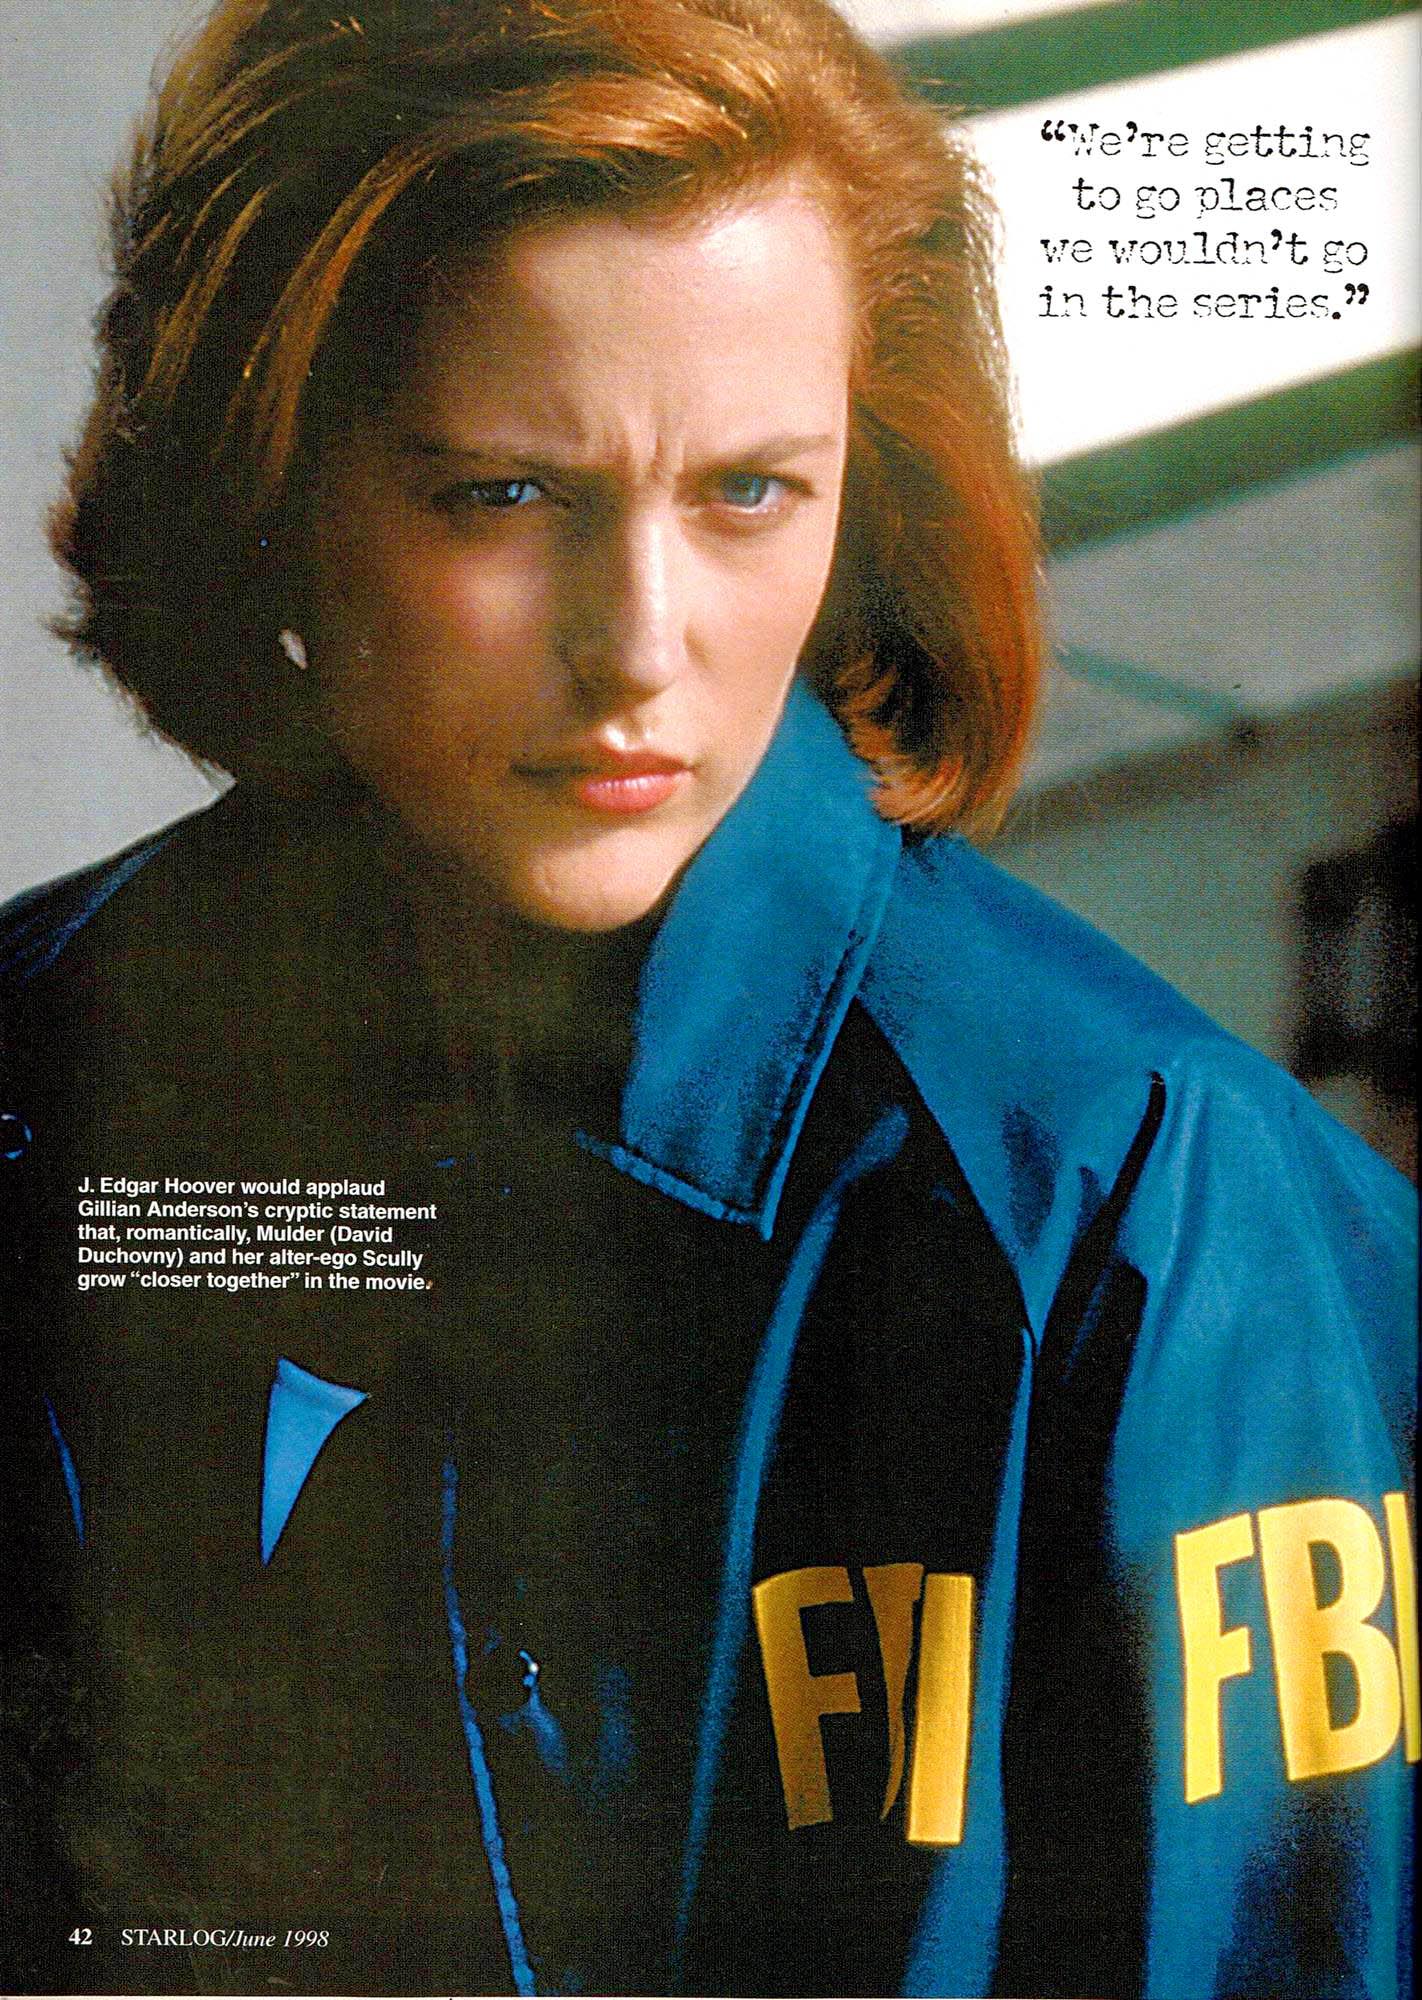 Starlog 251 1998 06 X-Files-4.jpg